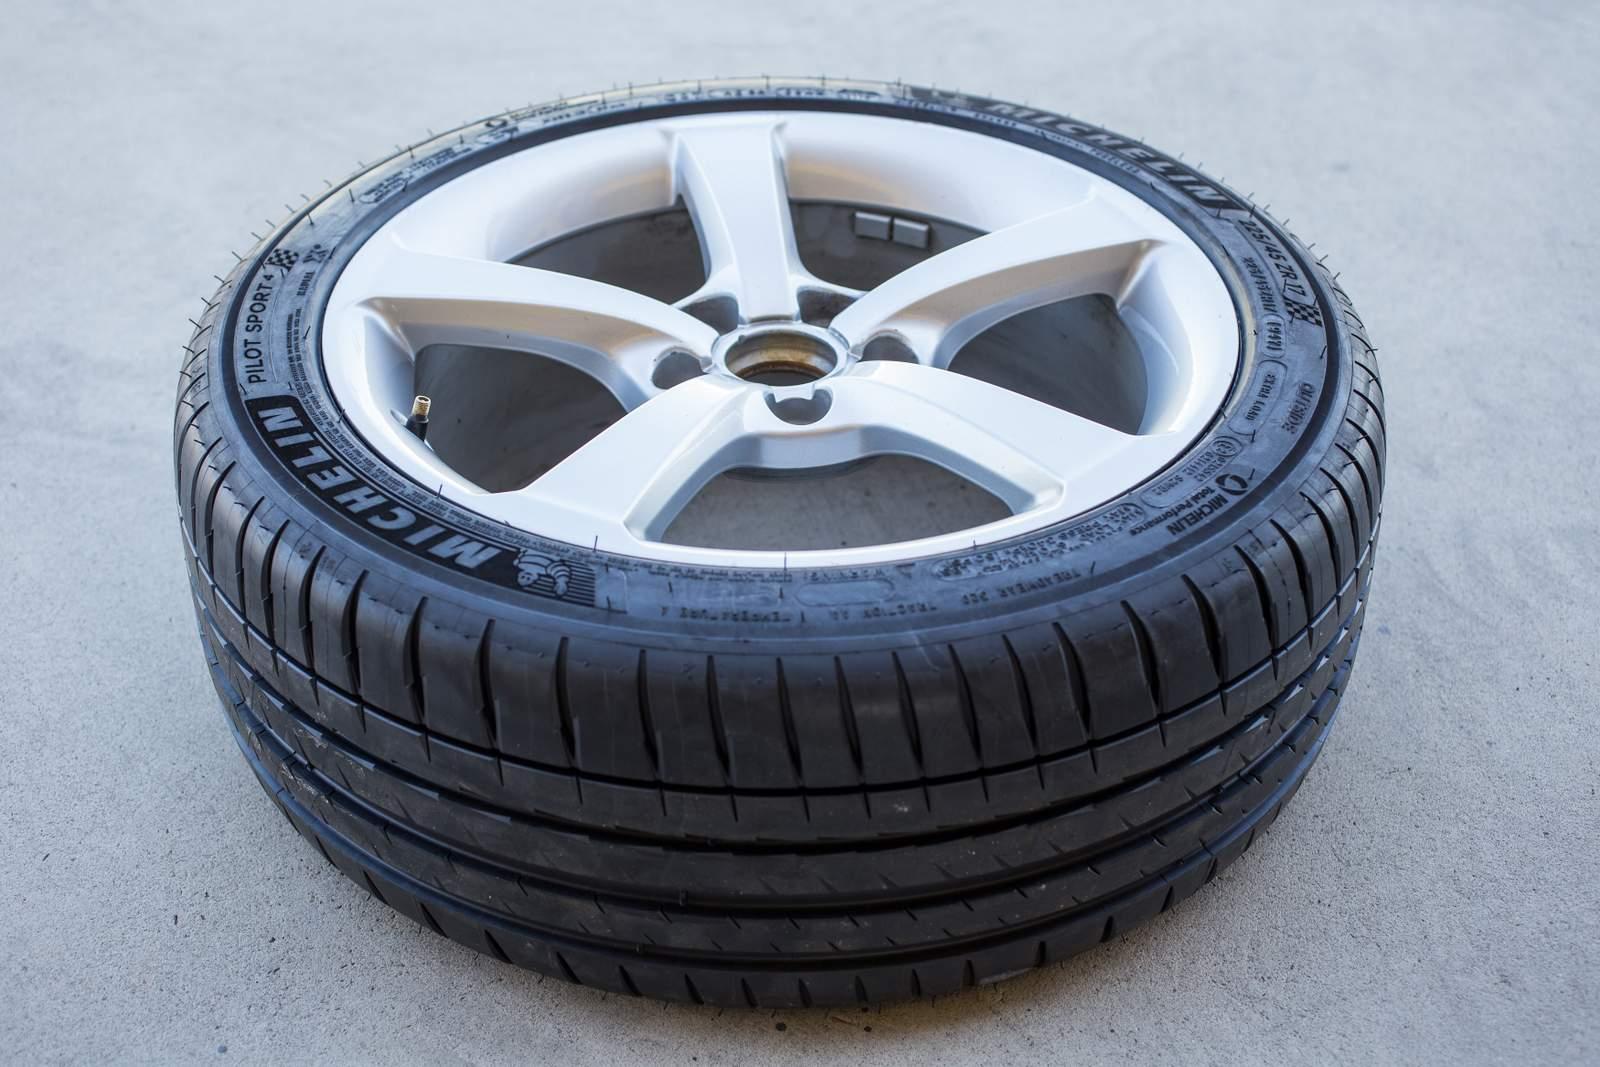 audi a3 sedan testa o novo pneu michelin pilot sport 4 car blog br. Black Bedroom Furniture Sets. Home Design Ideas